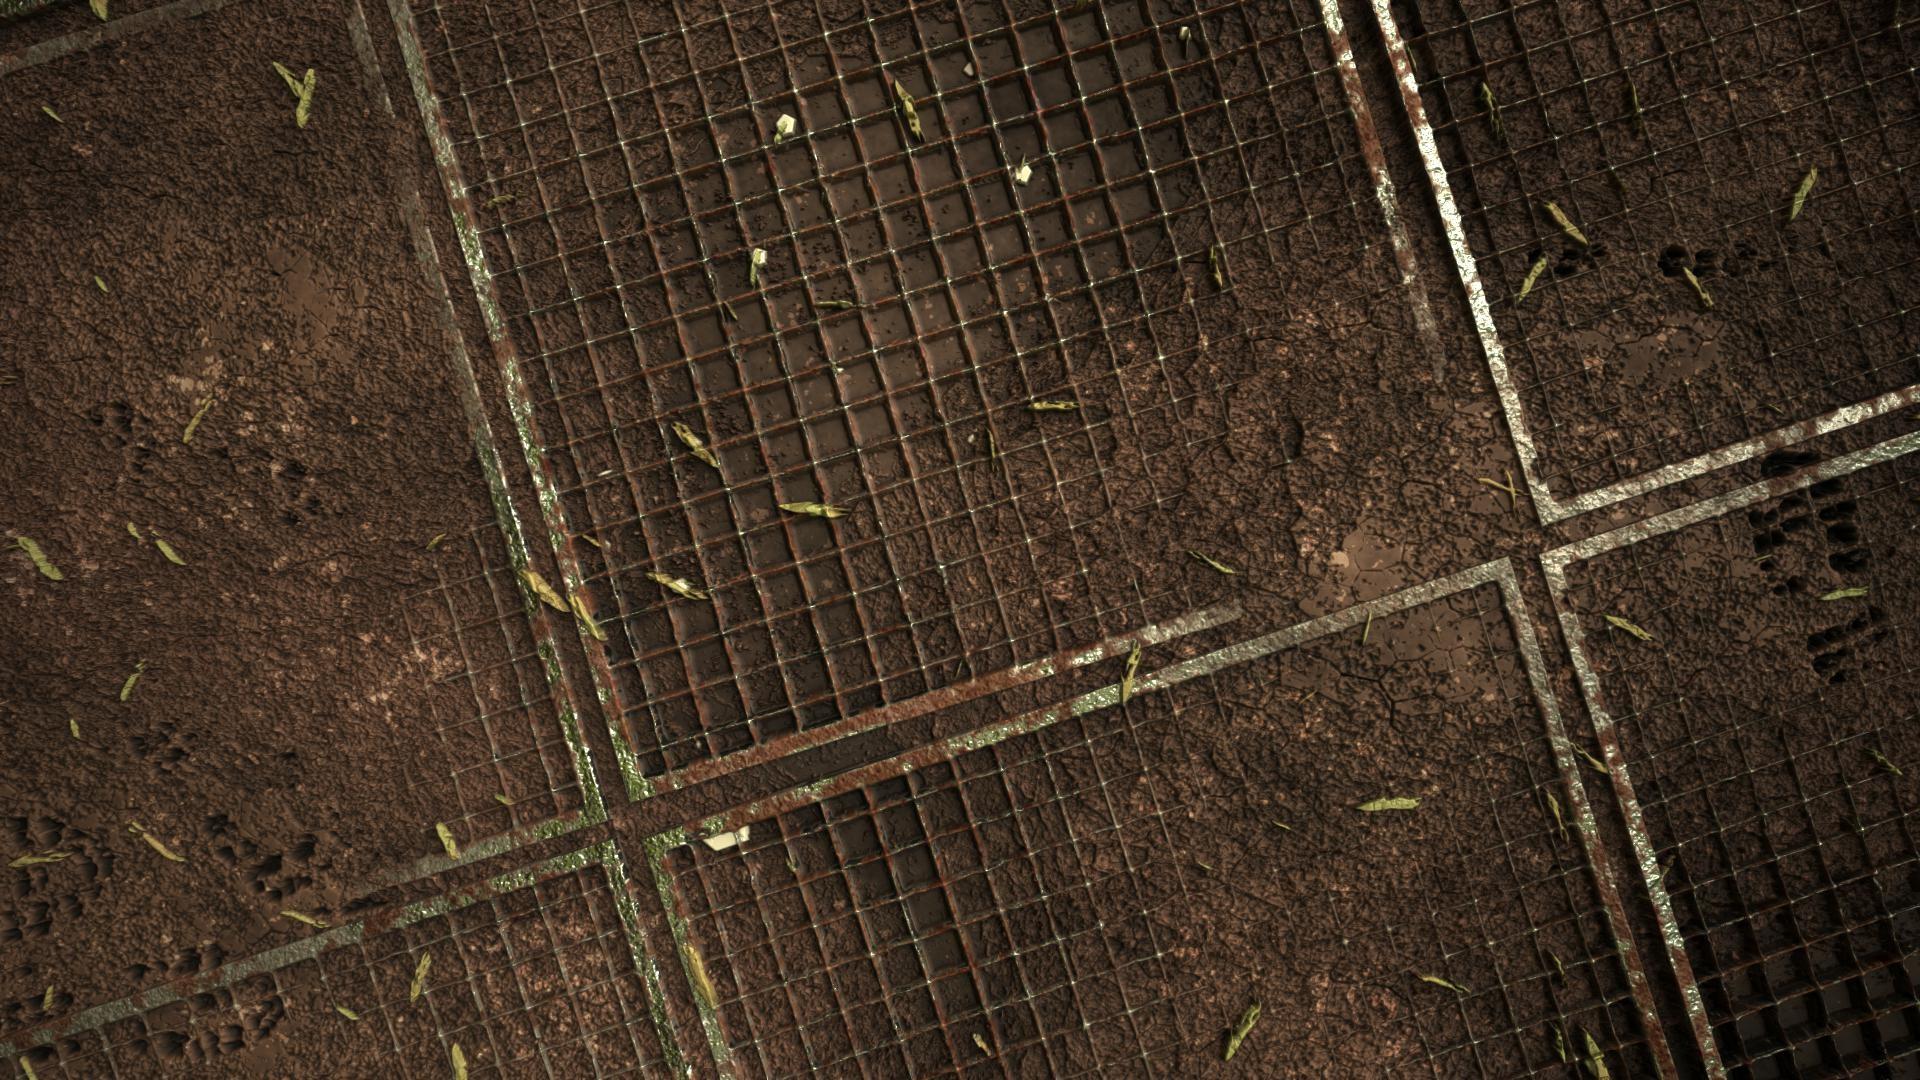 Leonardo iezzi ground texture 02